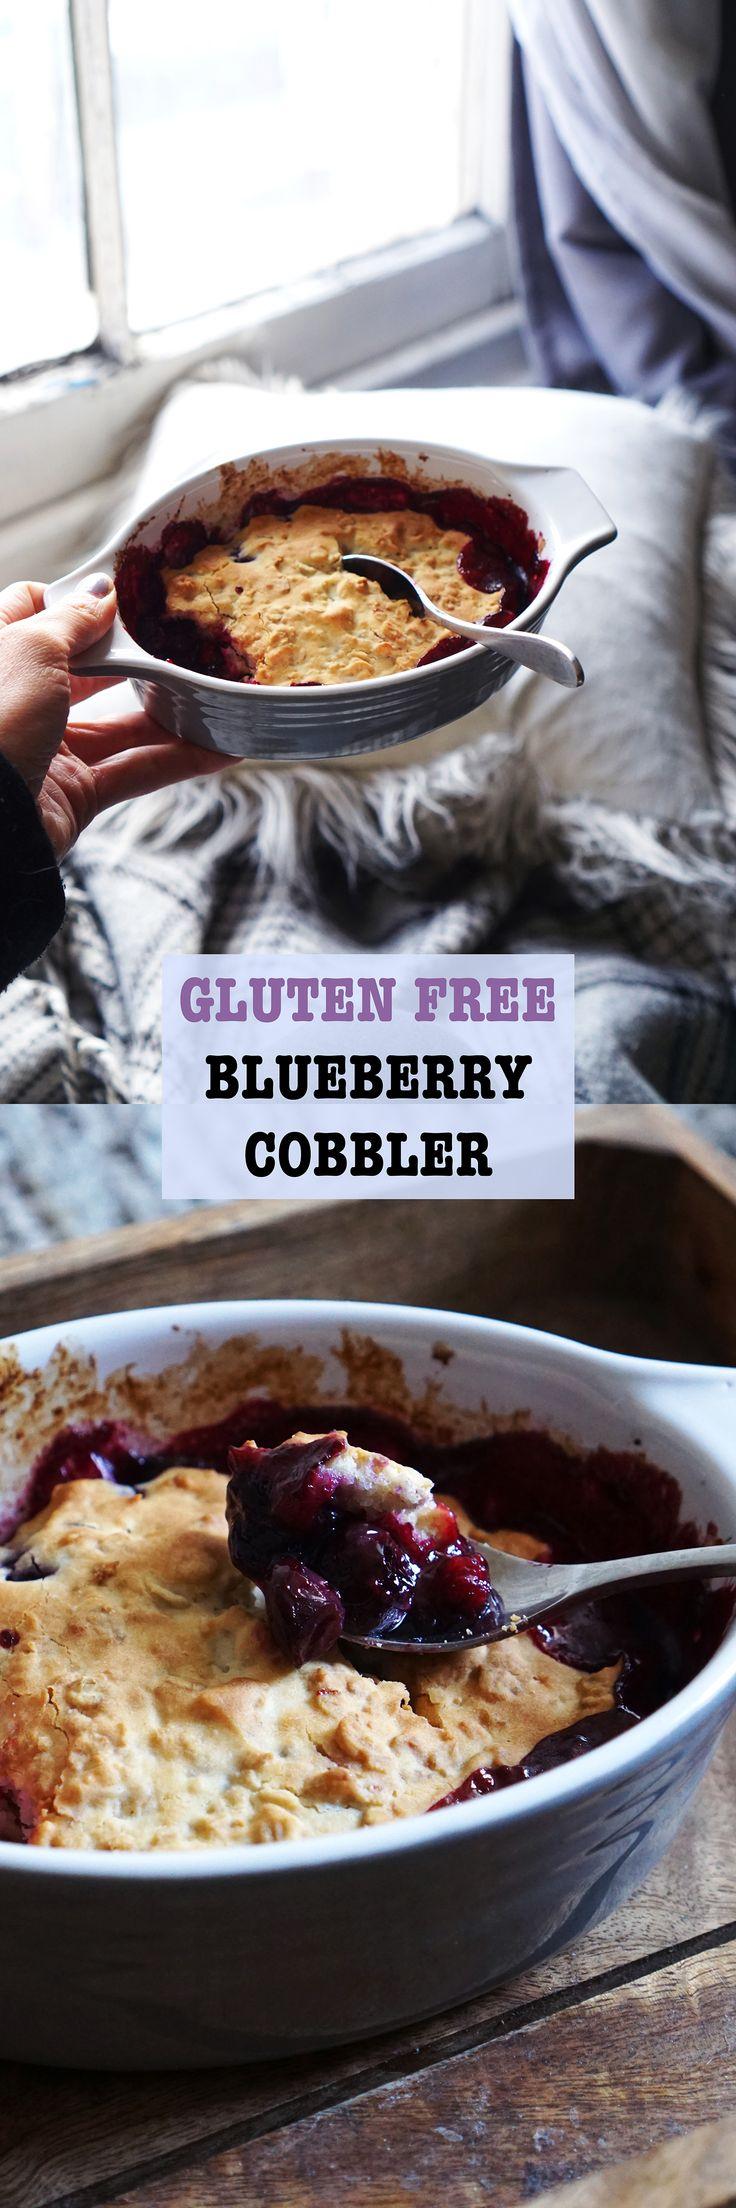 Gluten Free Blueberry Cobbler | #cobbler #blueberry #breakfast #dessert #glutenfree #gf #recipe #food #coeliac #baking #cooking